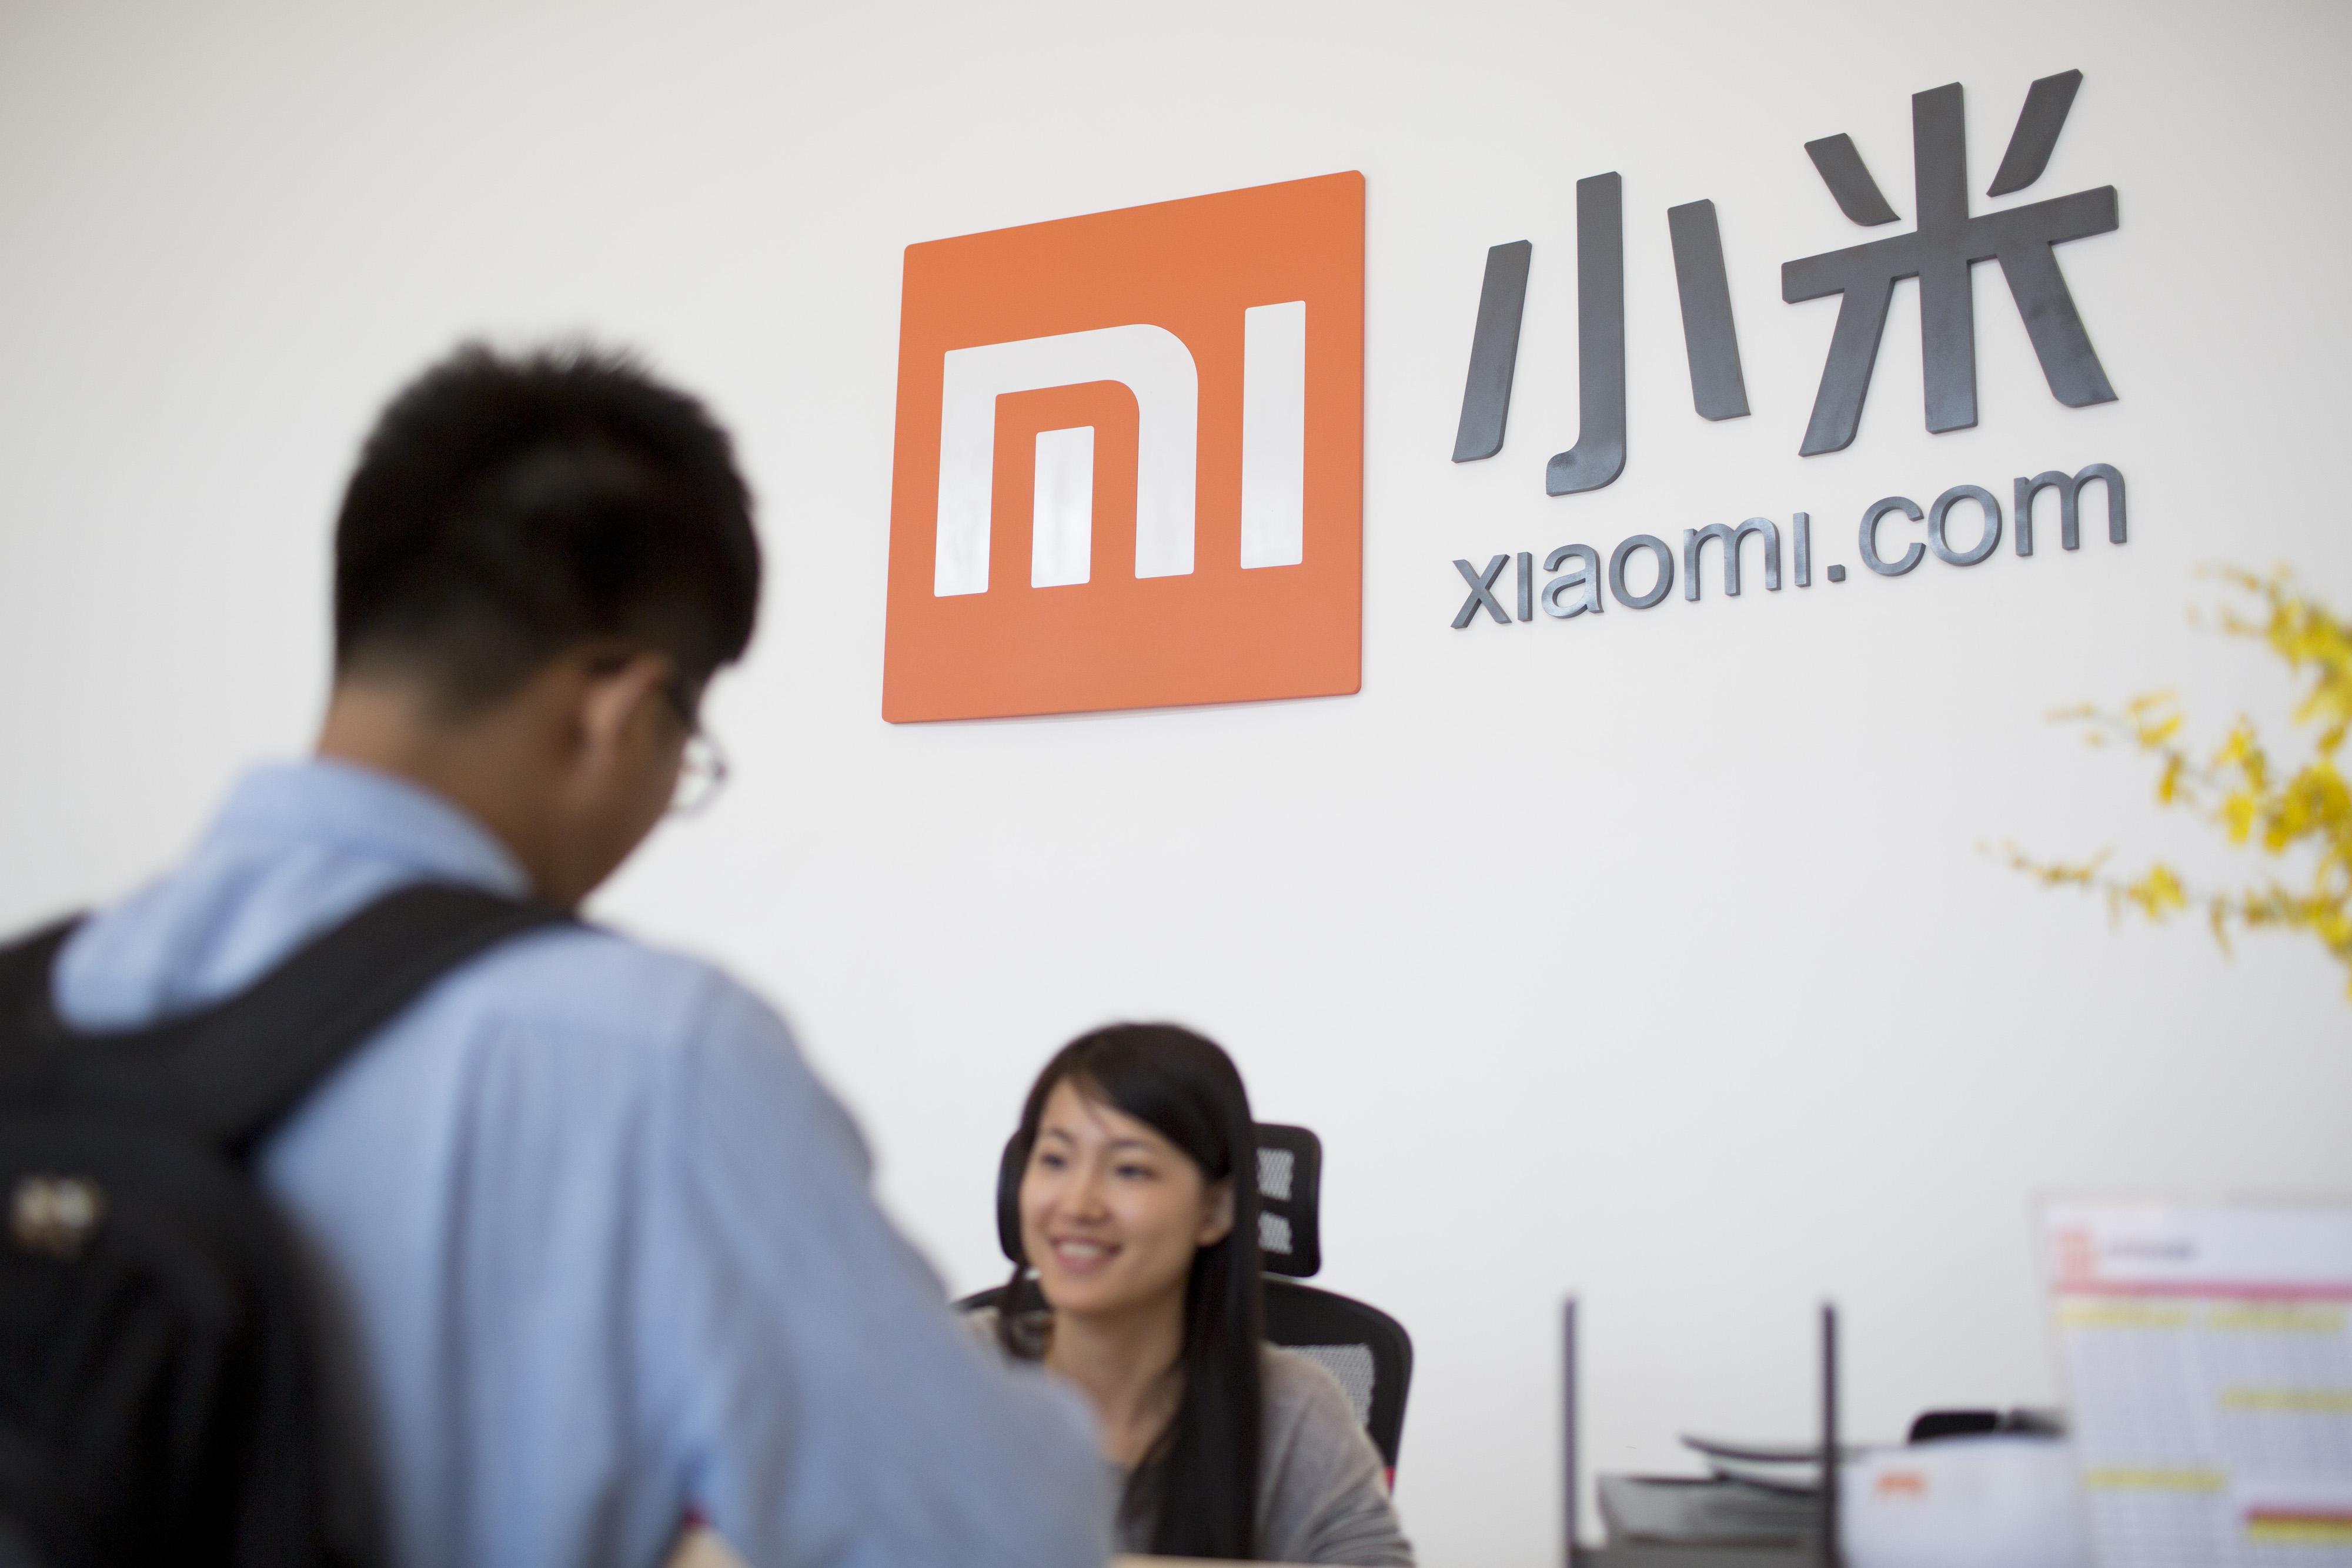 China's Xiaomi Raises $4.72 Billion After Pricing HK IPO at Bottom of Range